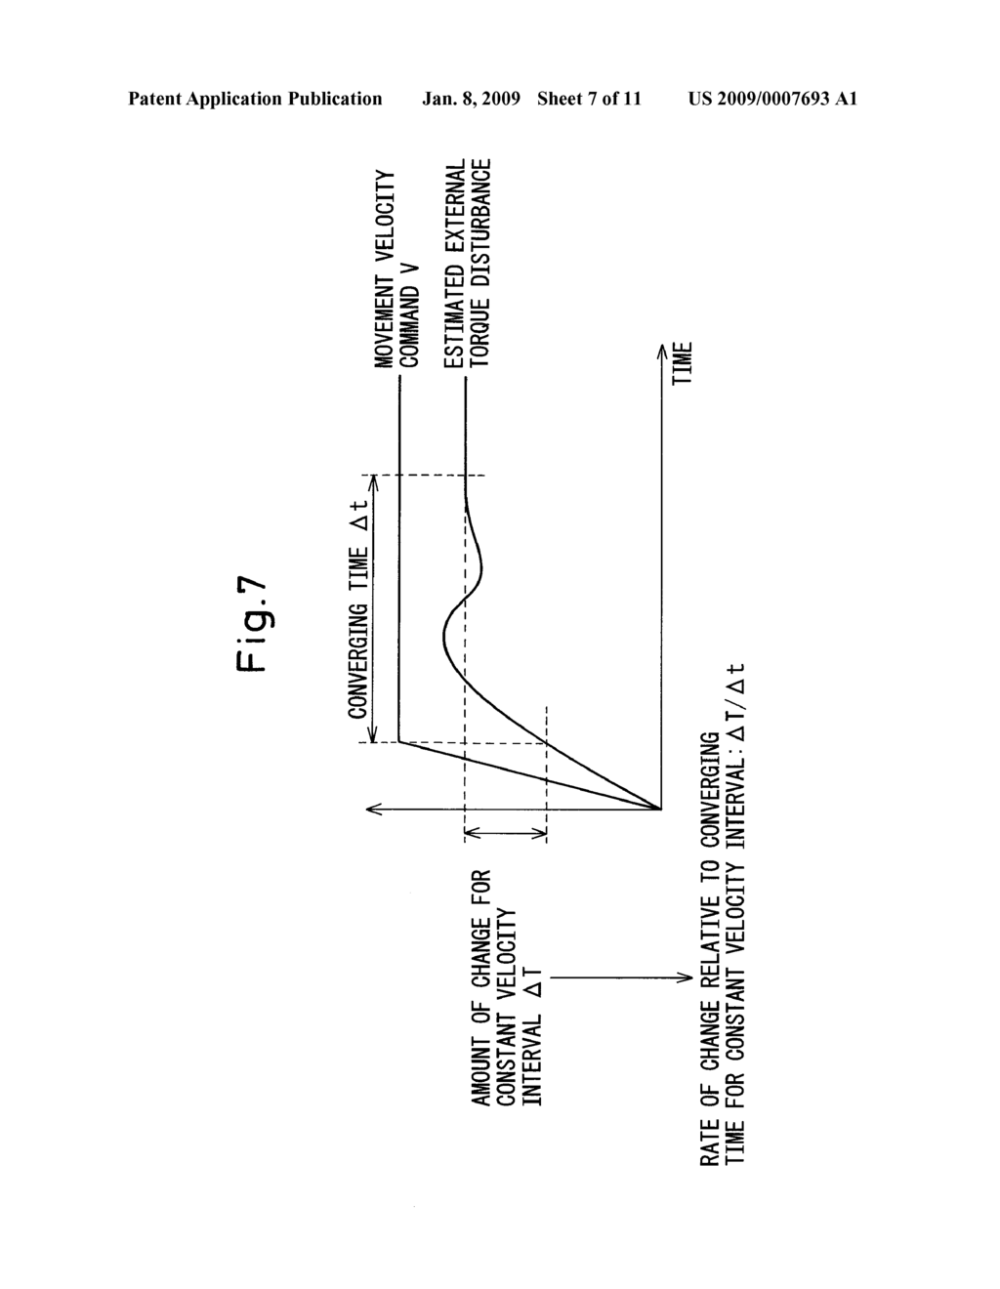 medium resolution of method of determining deterioration of pressurizing performance of spot welding gun diagram schematic